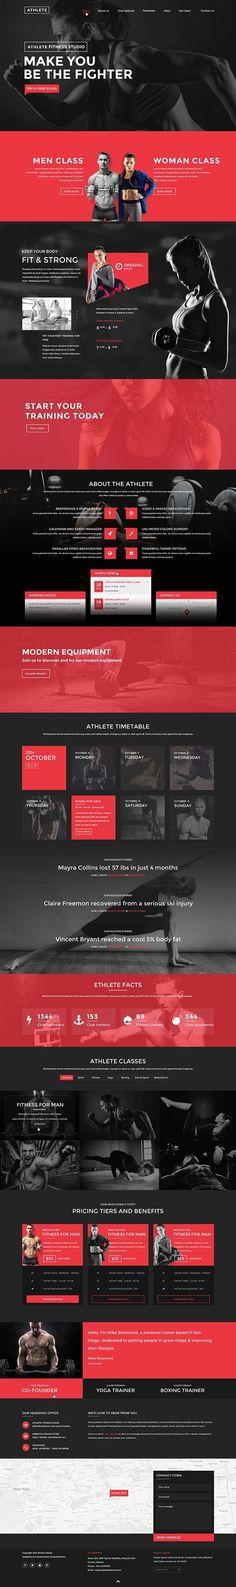 Athlete - Fitness, Gym and Sport Wordpress theme on Behance